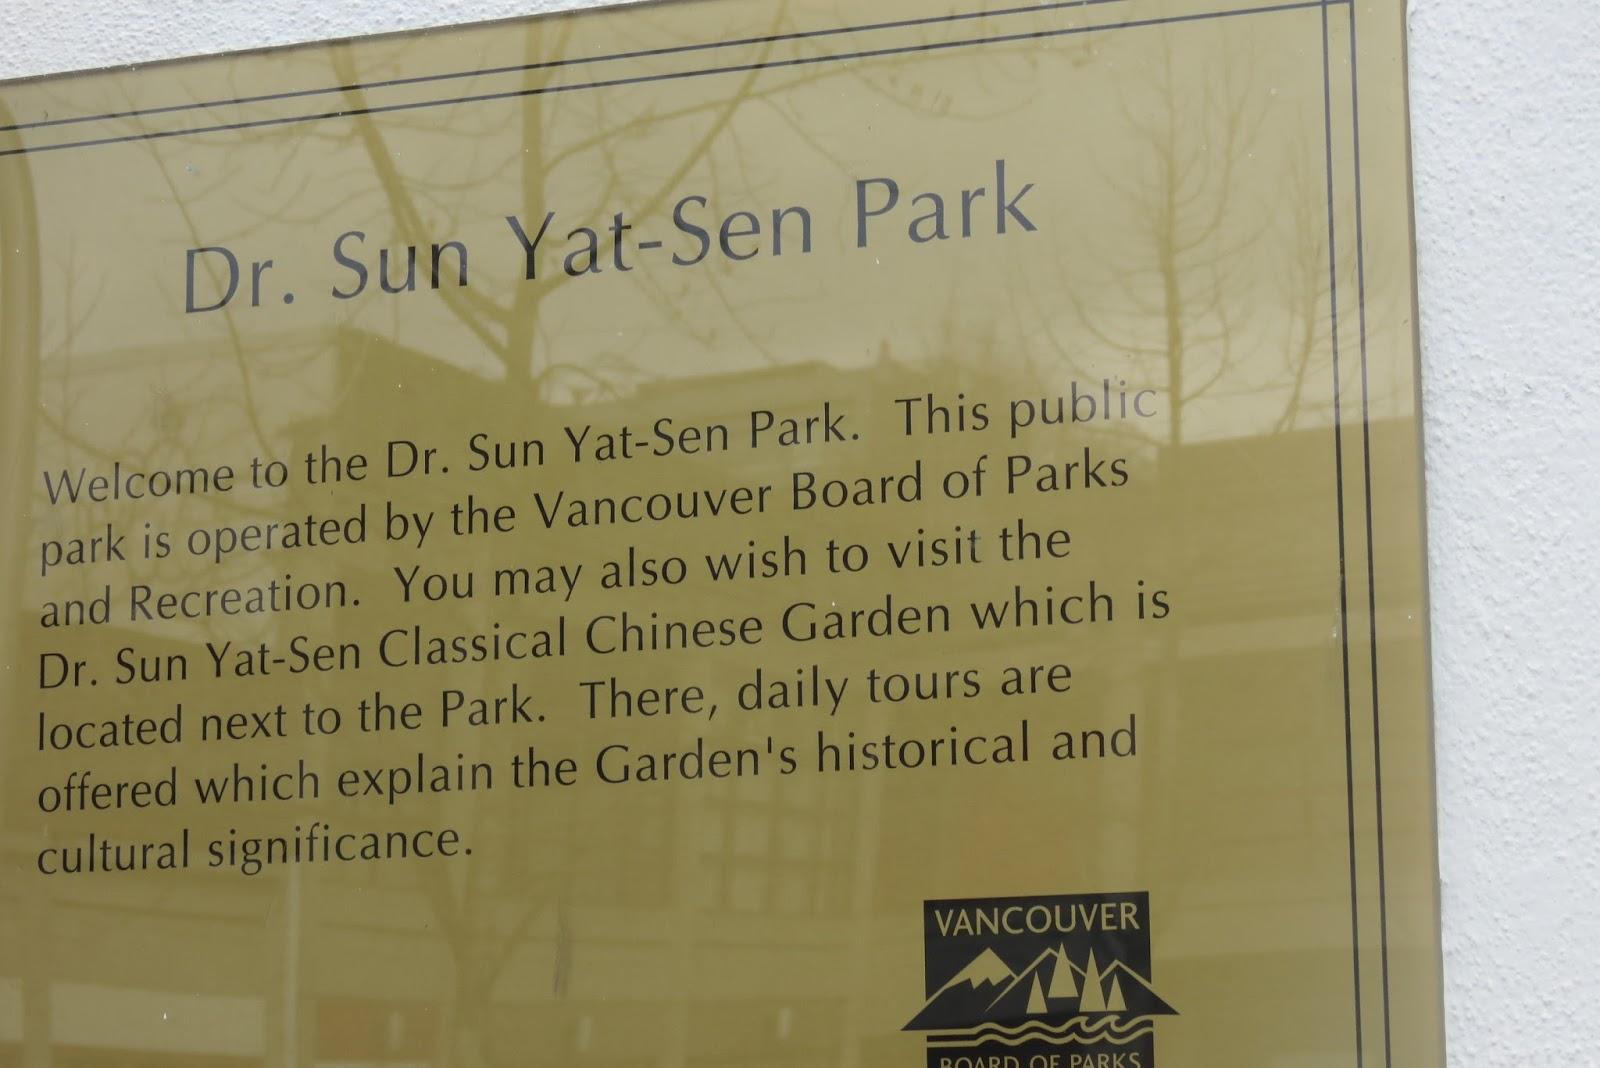 Adventures in PEI and Beyond!: Dr. Sun Yat Sen Garden - an Urban ...